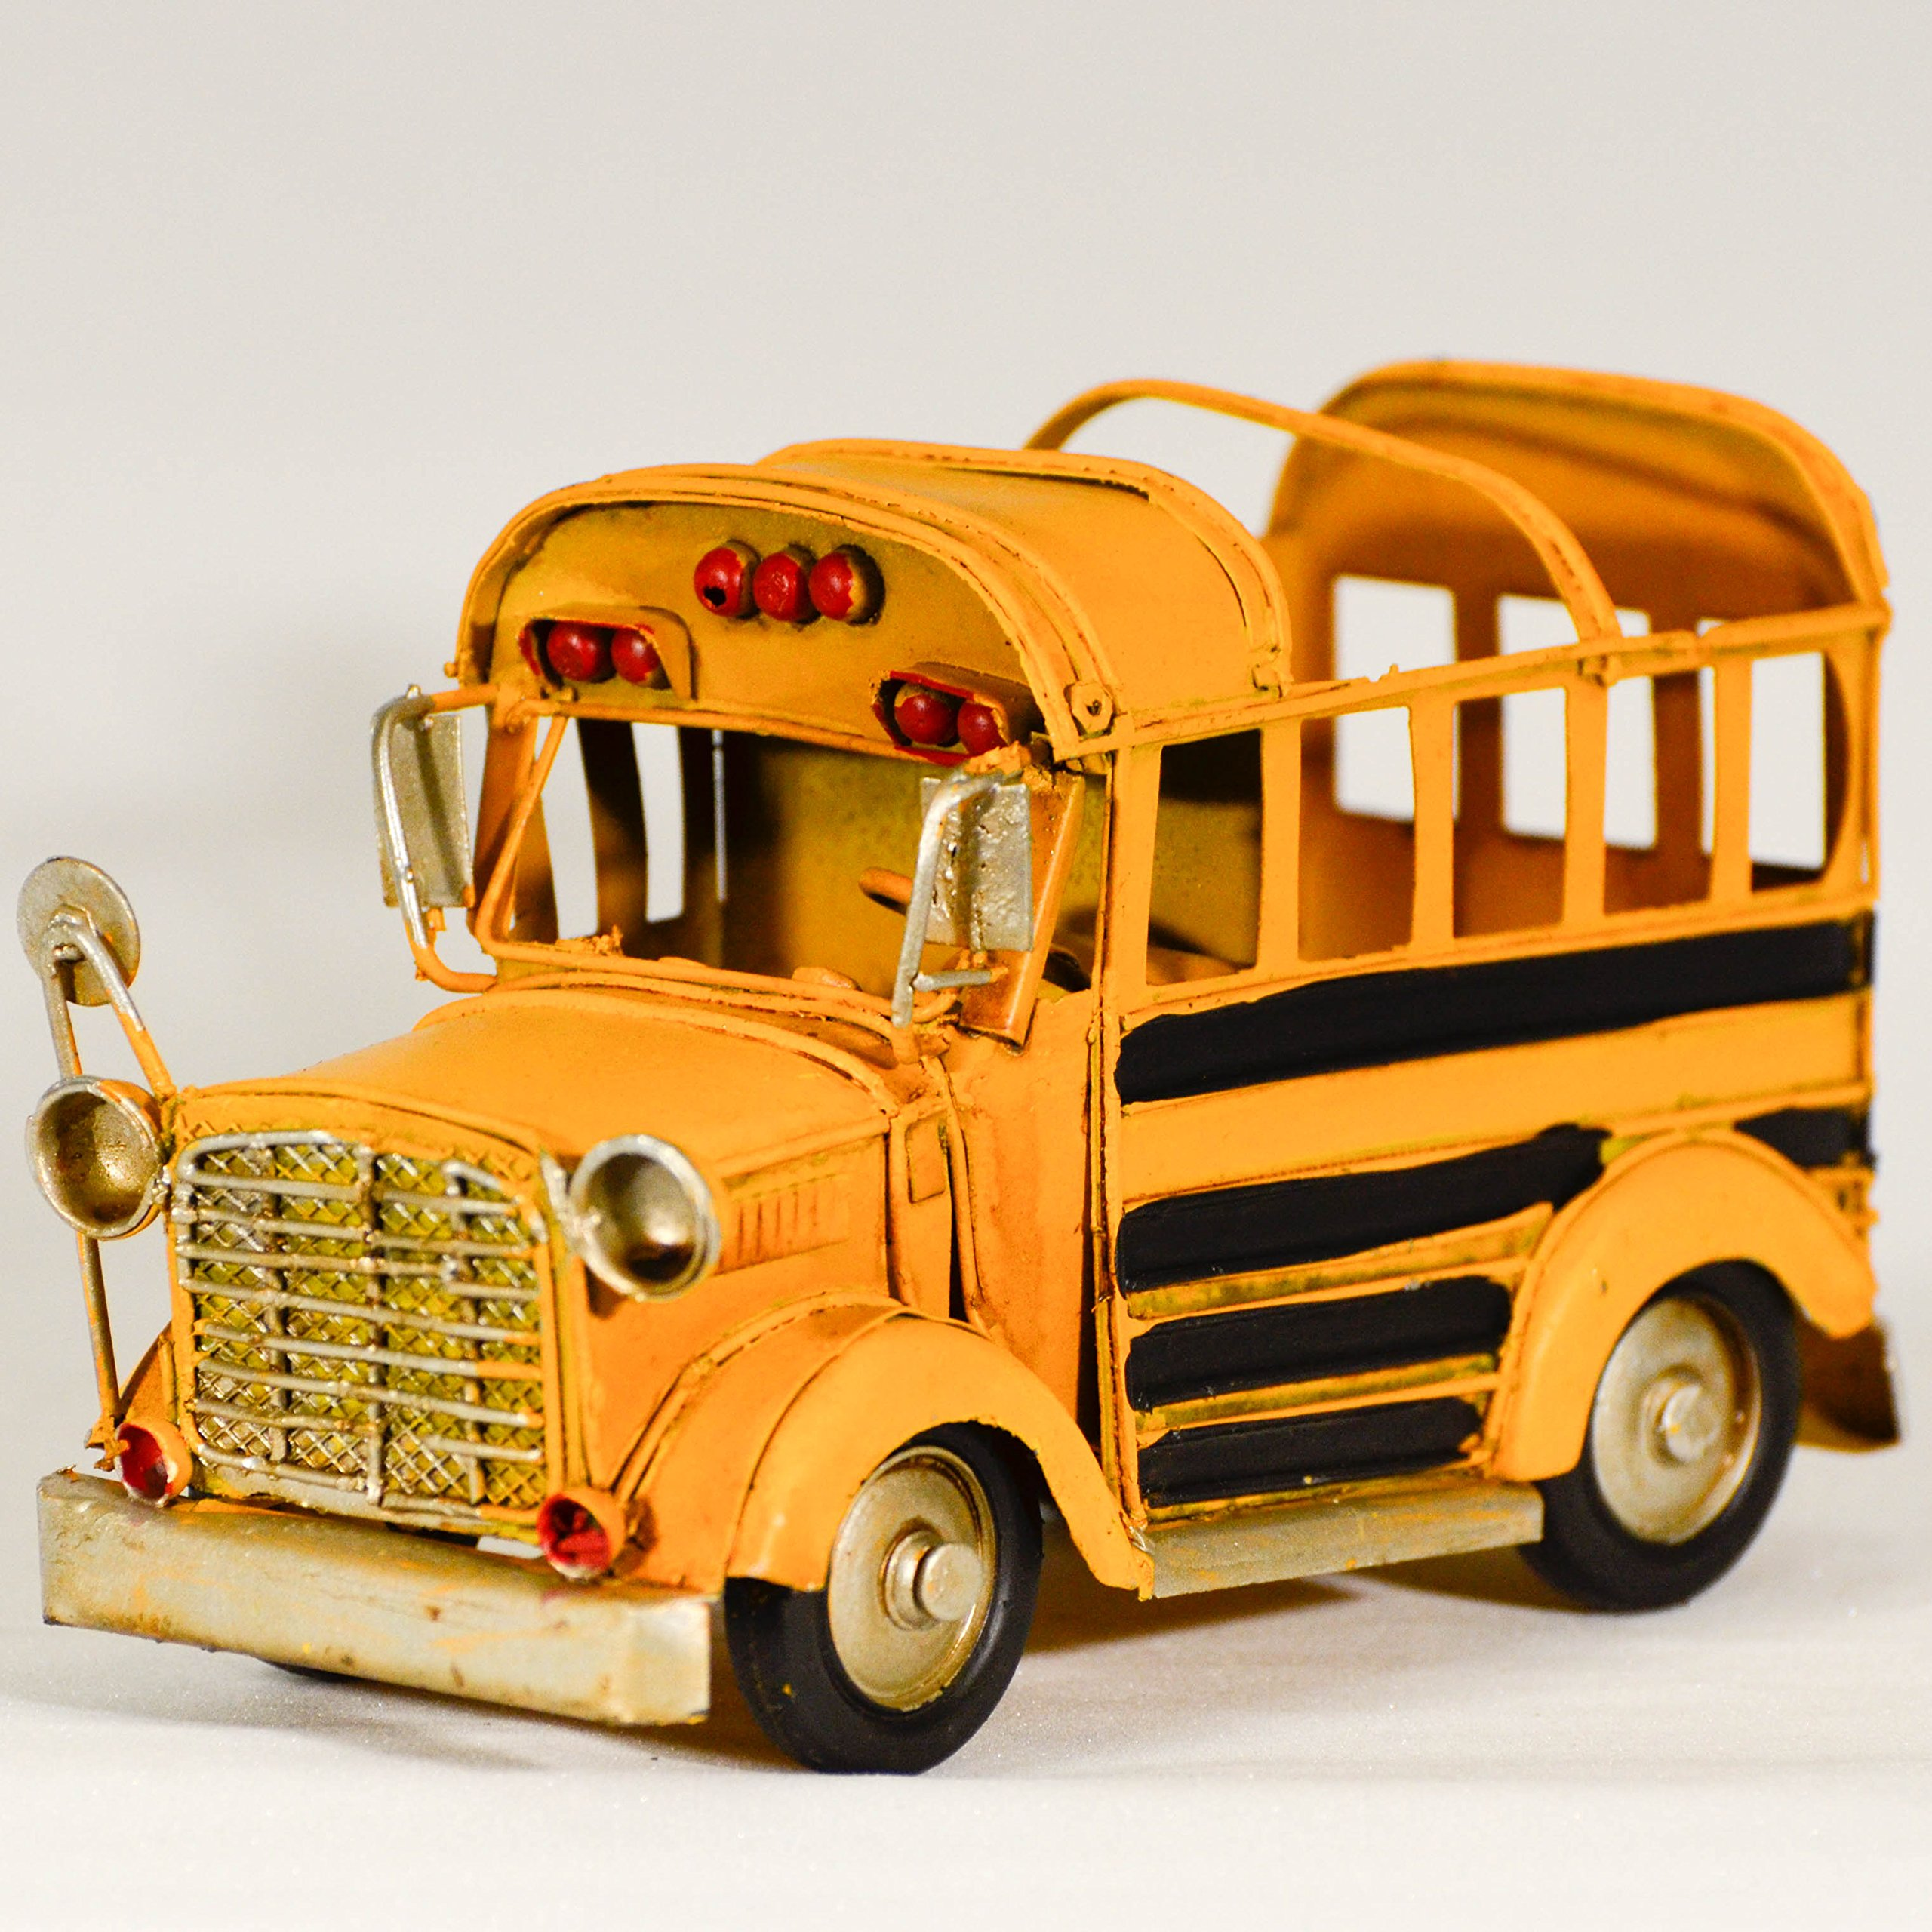 EliteTreasures Back To School Metal Yellow 1980 Vintage Style Collectible School Bus Model - Retro Pencil Case - Old School Vehicle - Industrial Decor Miniature